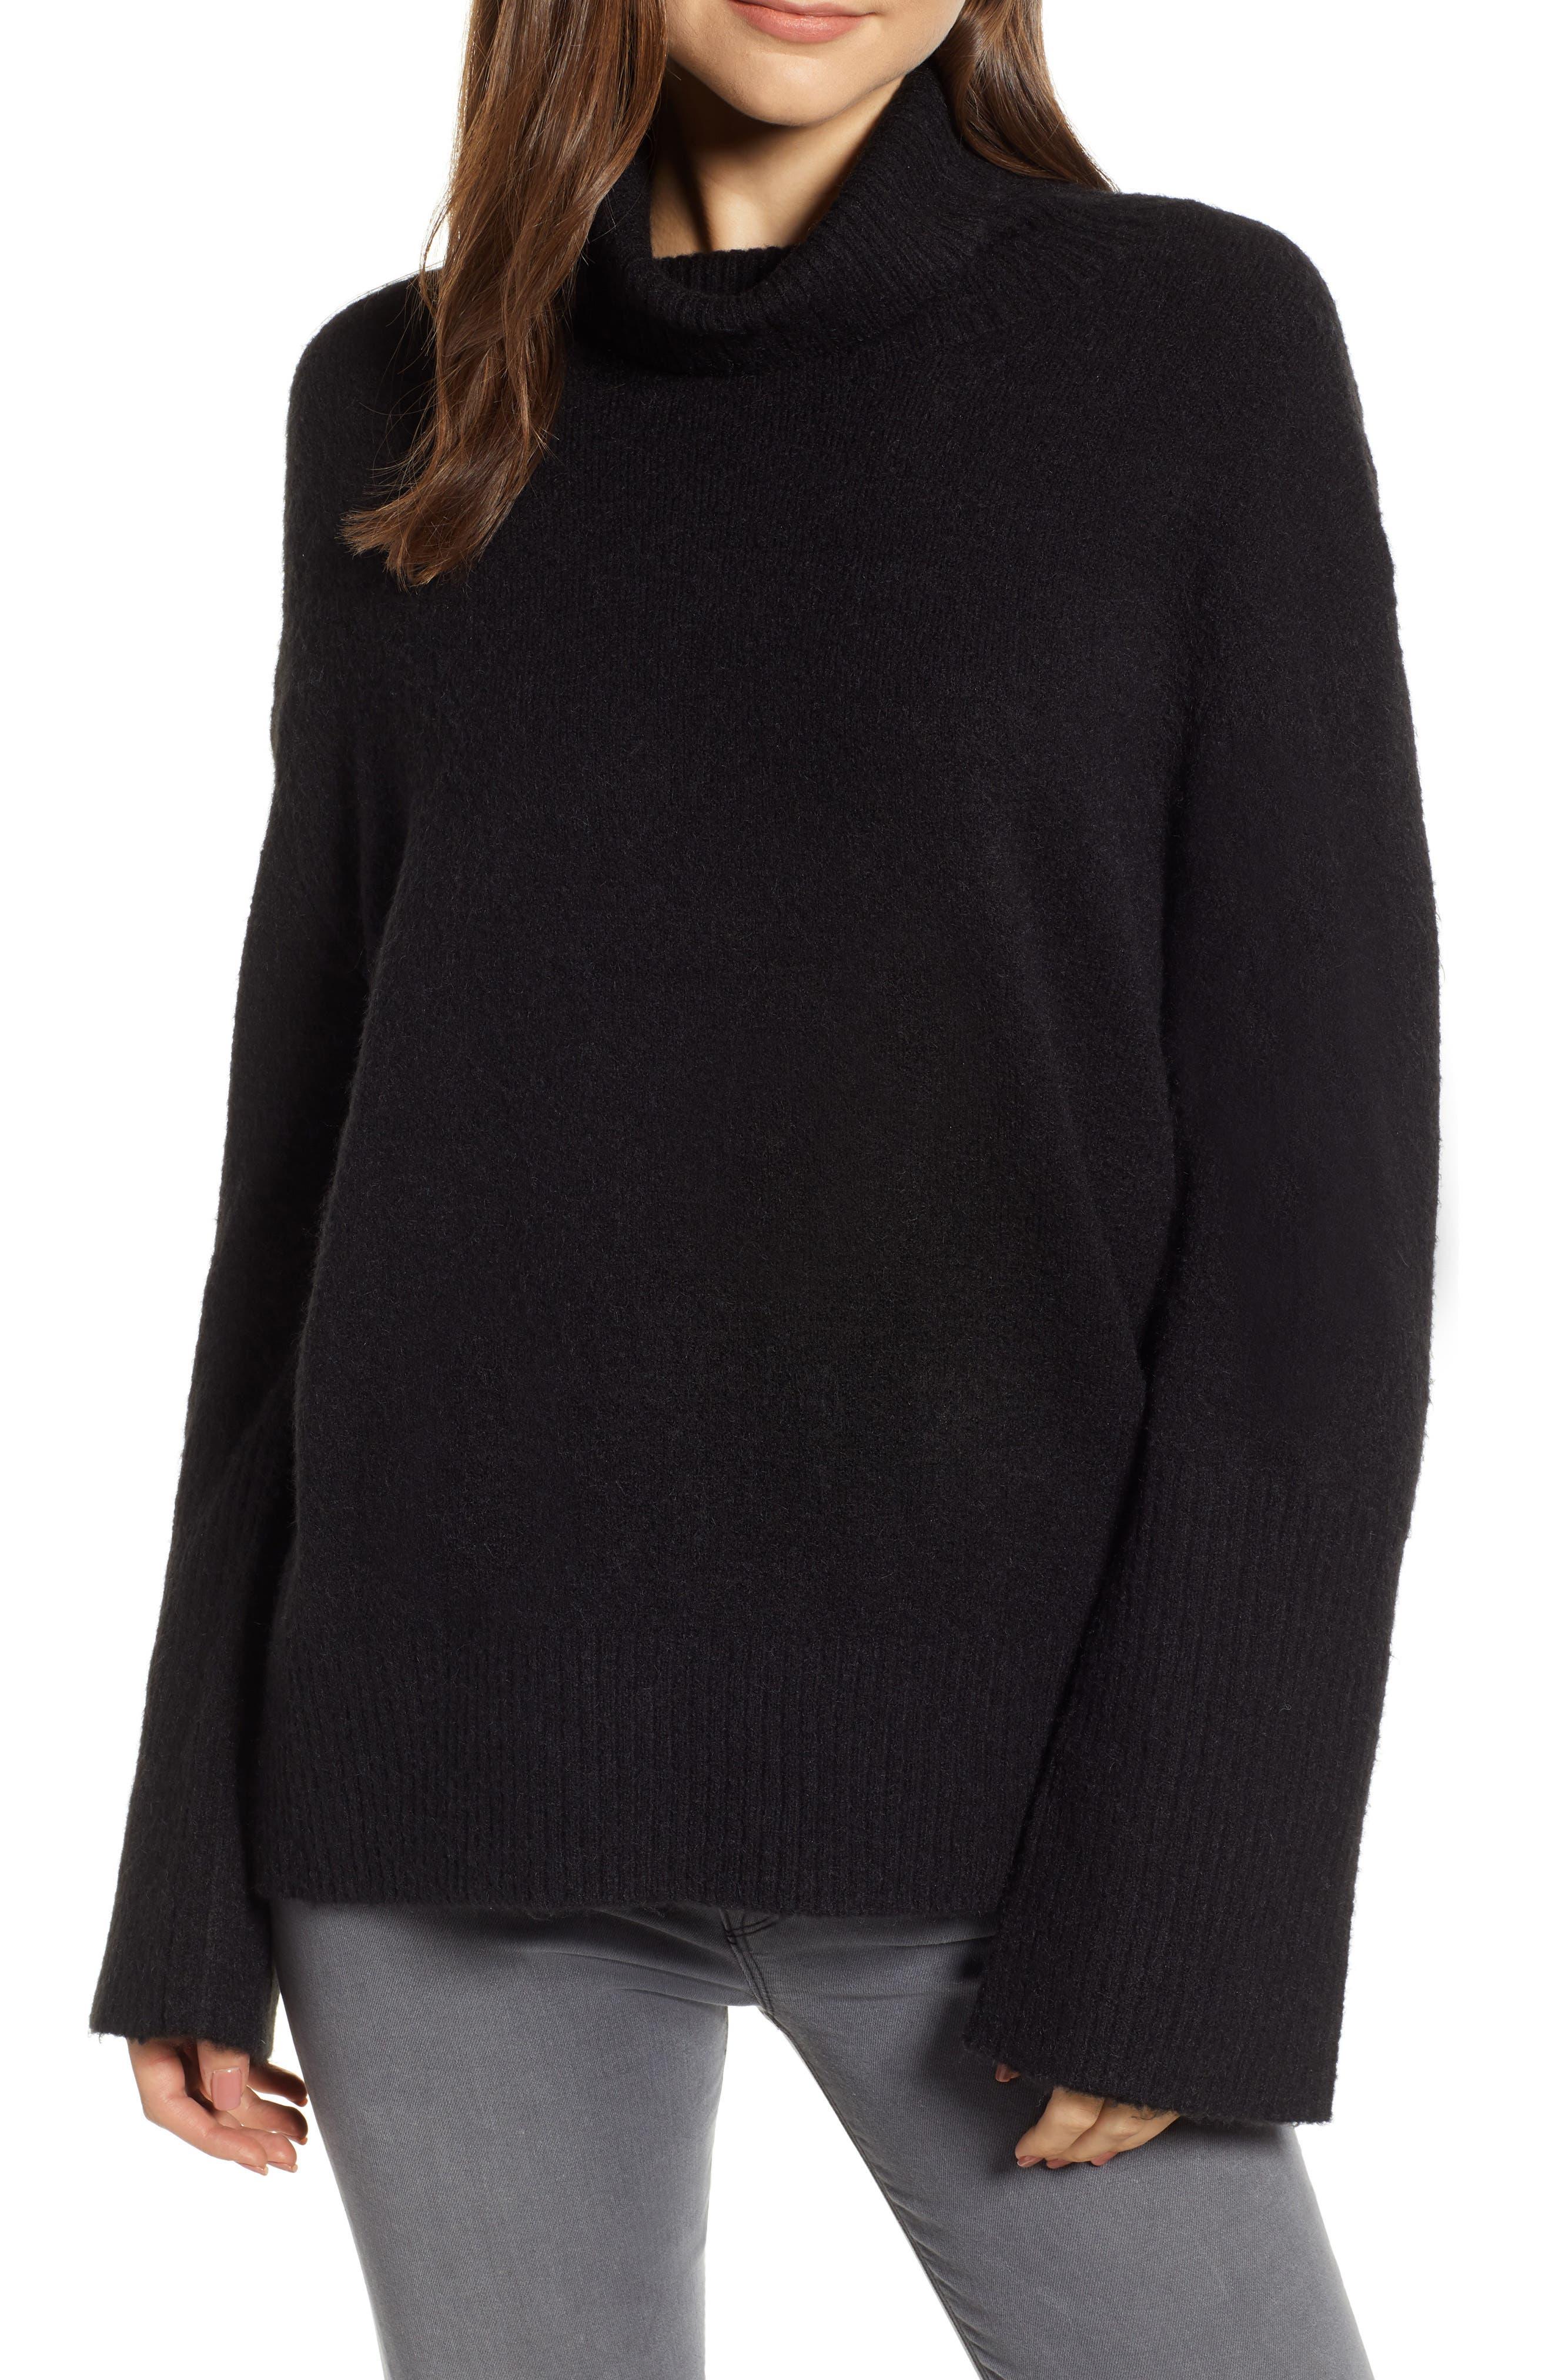 HINGE,                             Bell Sleeve Sweater,                             Main thumbnail 1, color,                             BLACK